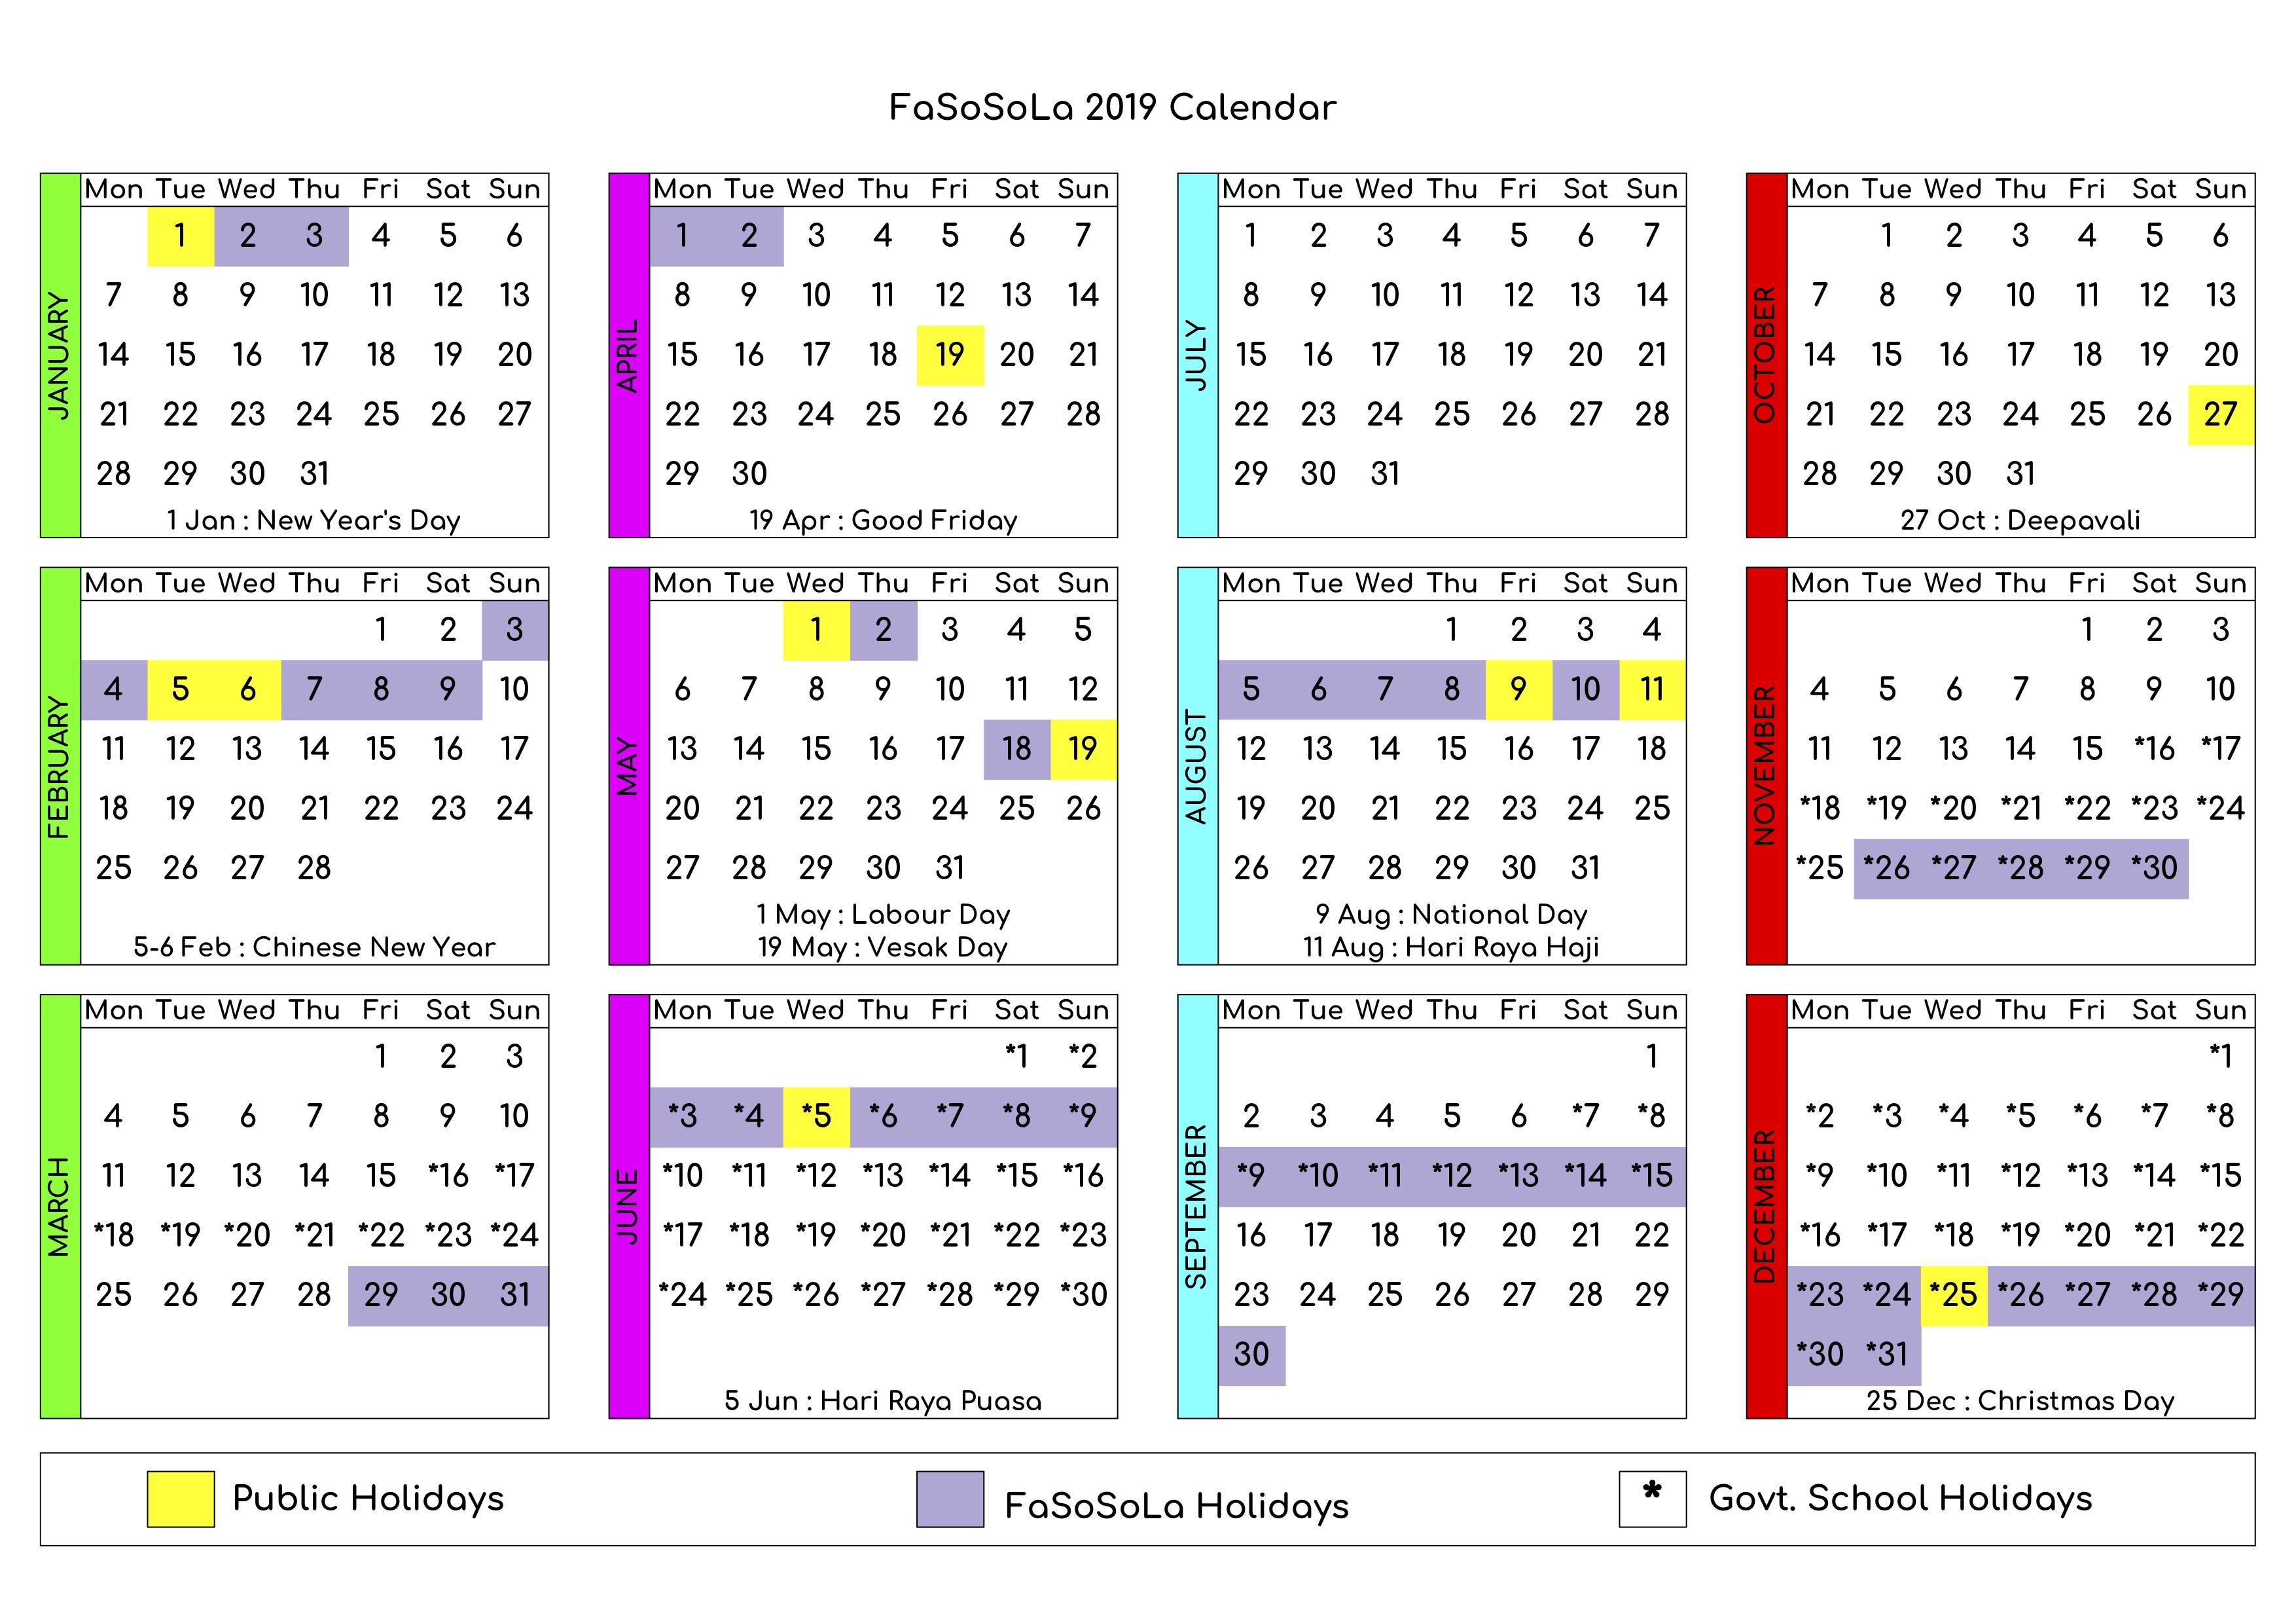 FaSoSoLa 2019 Calendar